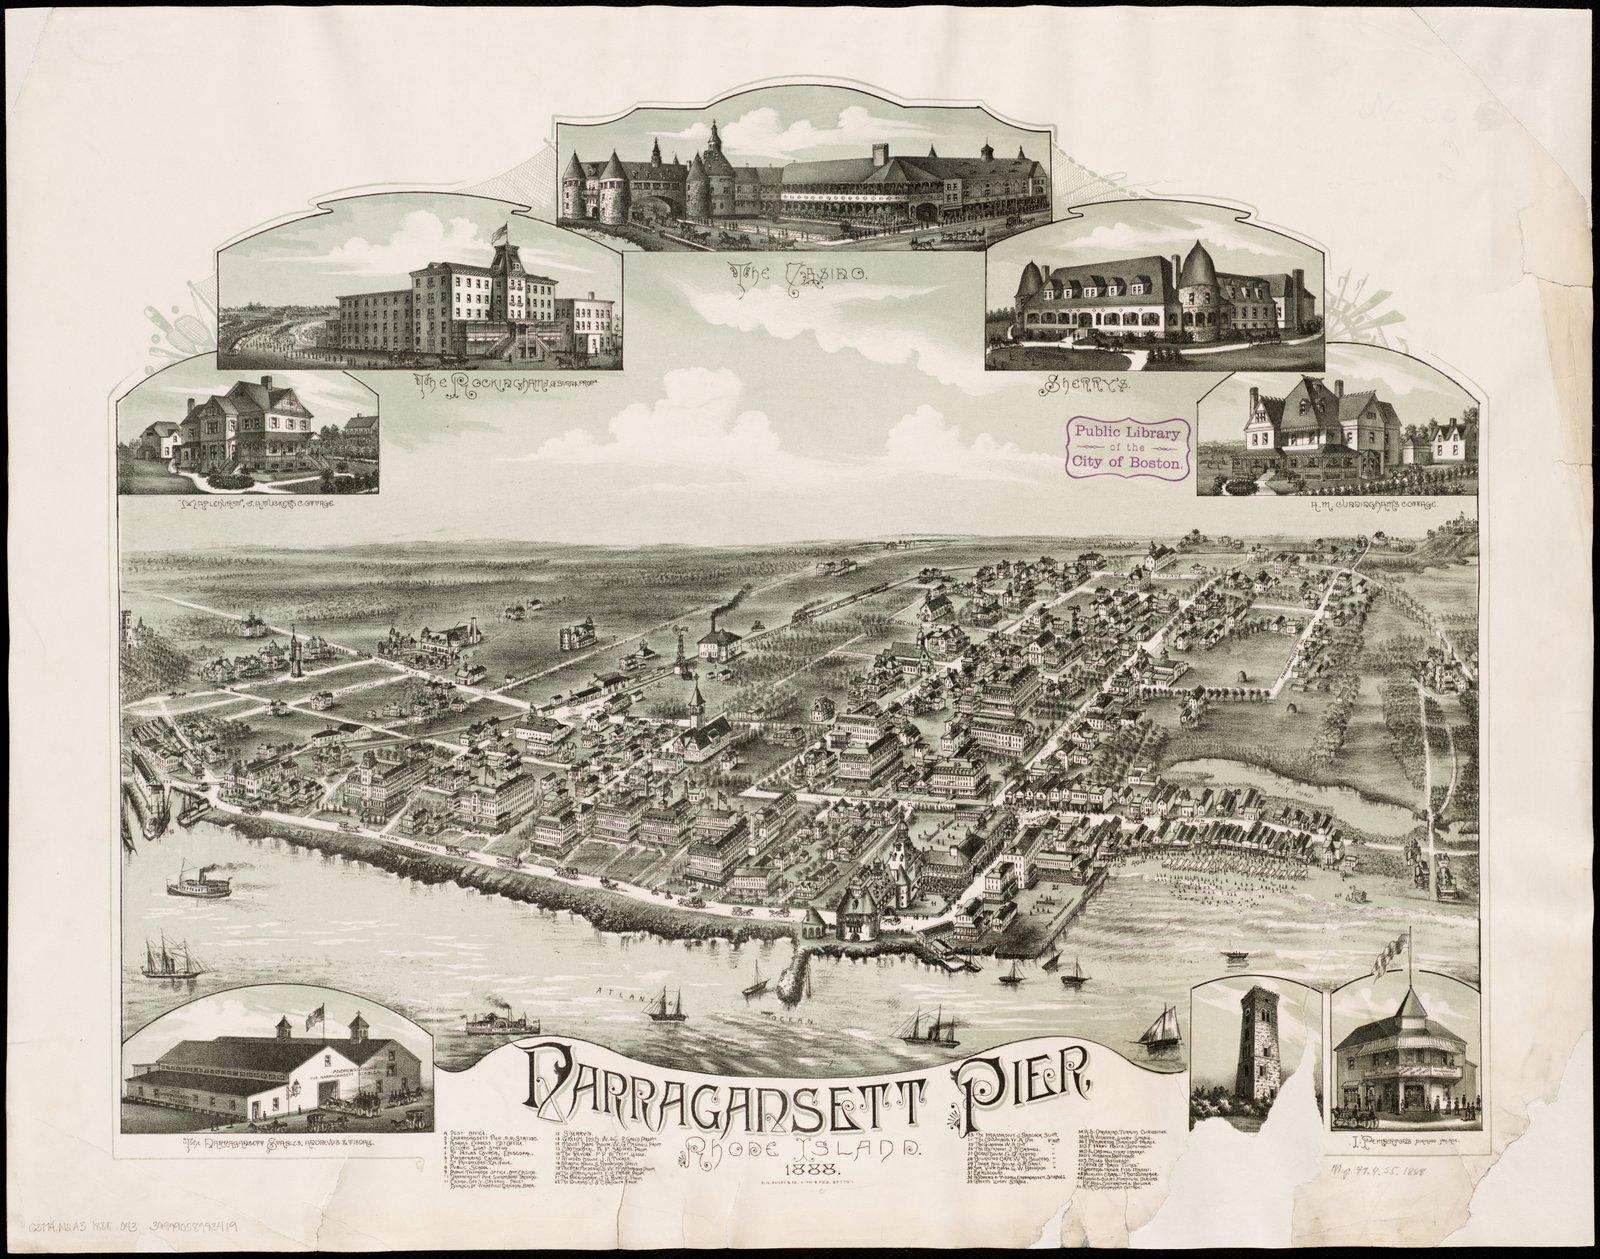 Historic Map | Narragansett Pier, Rhode Island : 1888 | Antique Vintage Reproduction